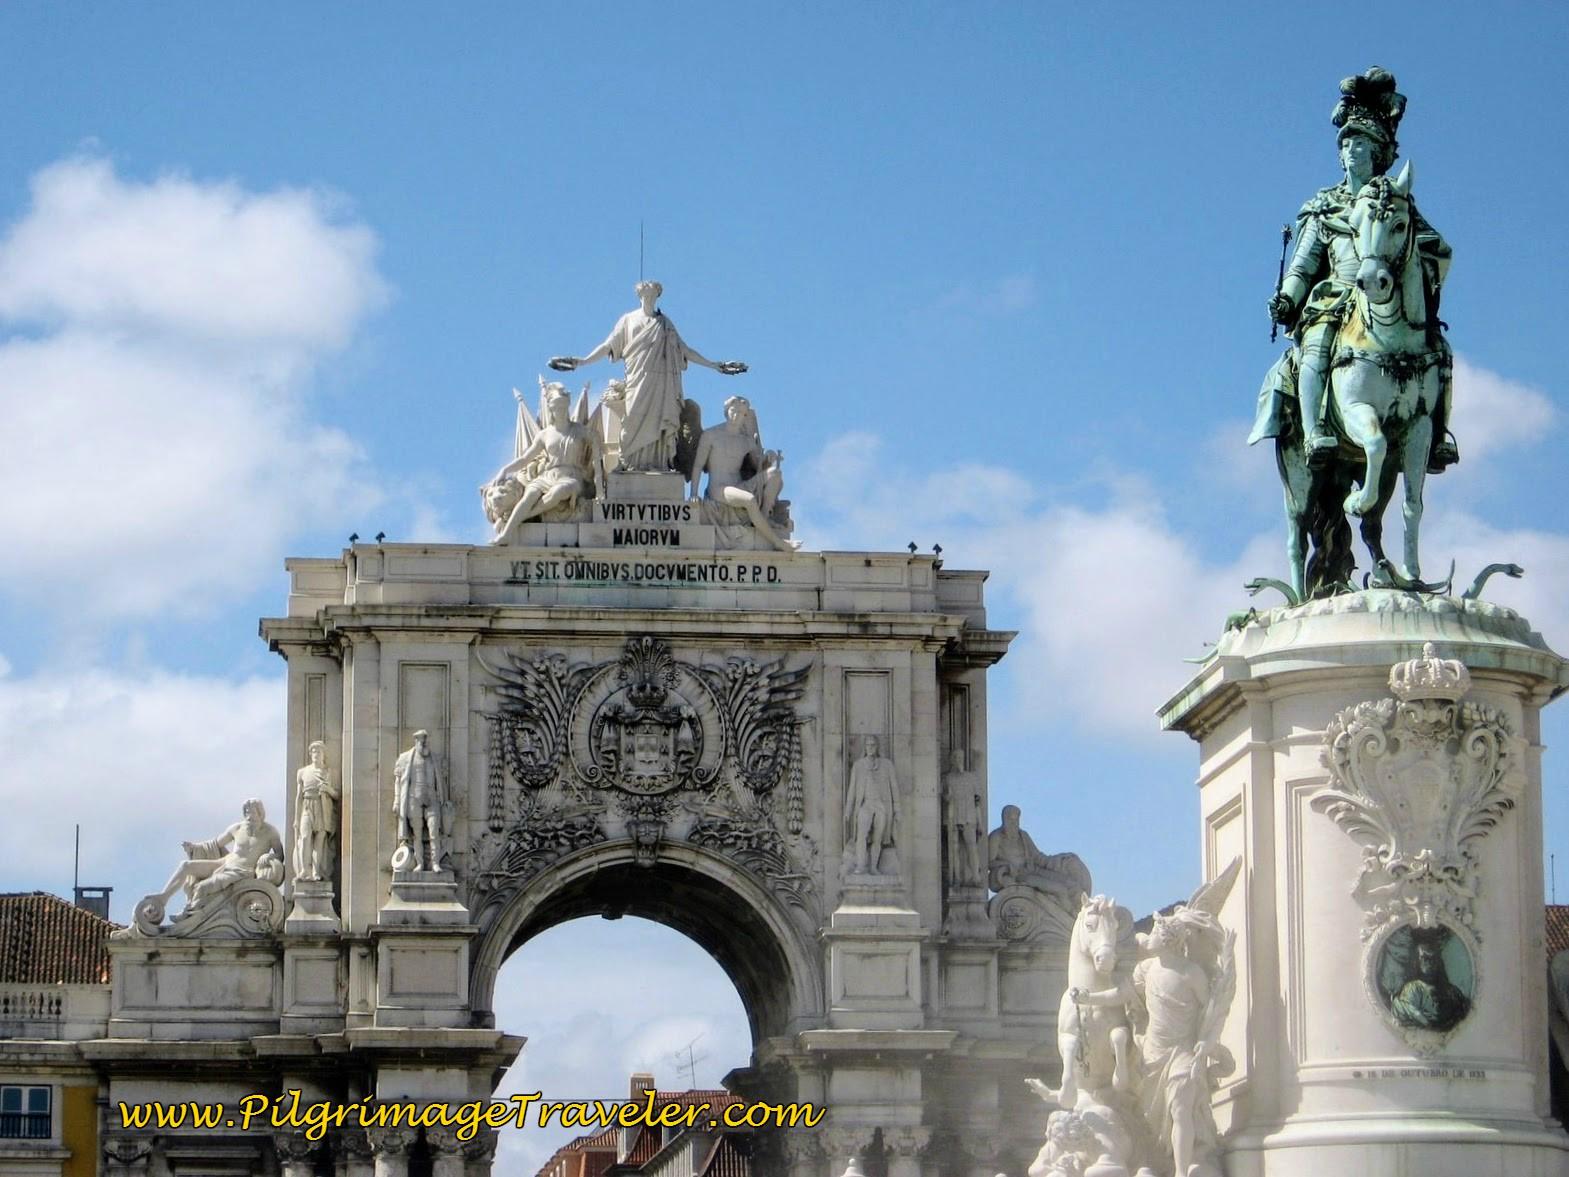 Triumphal Arch and King Jose, I on Horseback, Praca do Comercio, Lisbon, Portugal